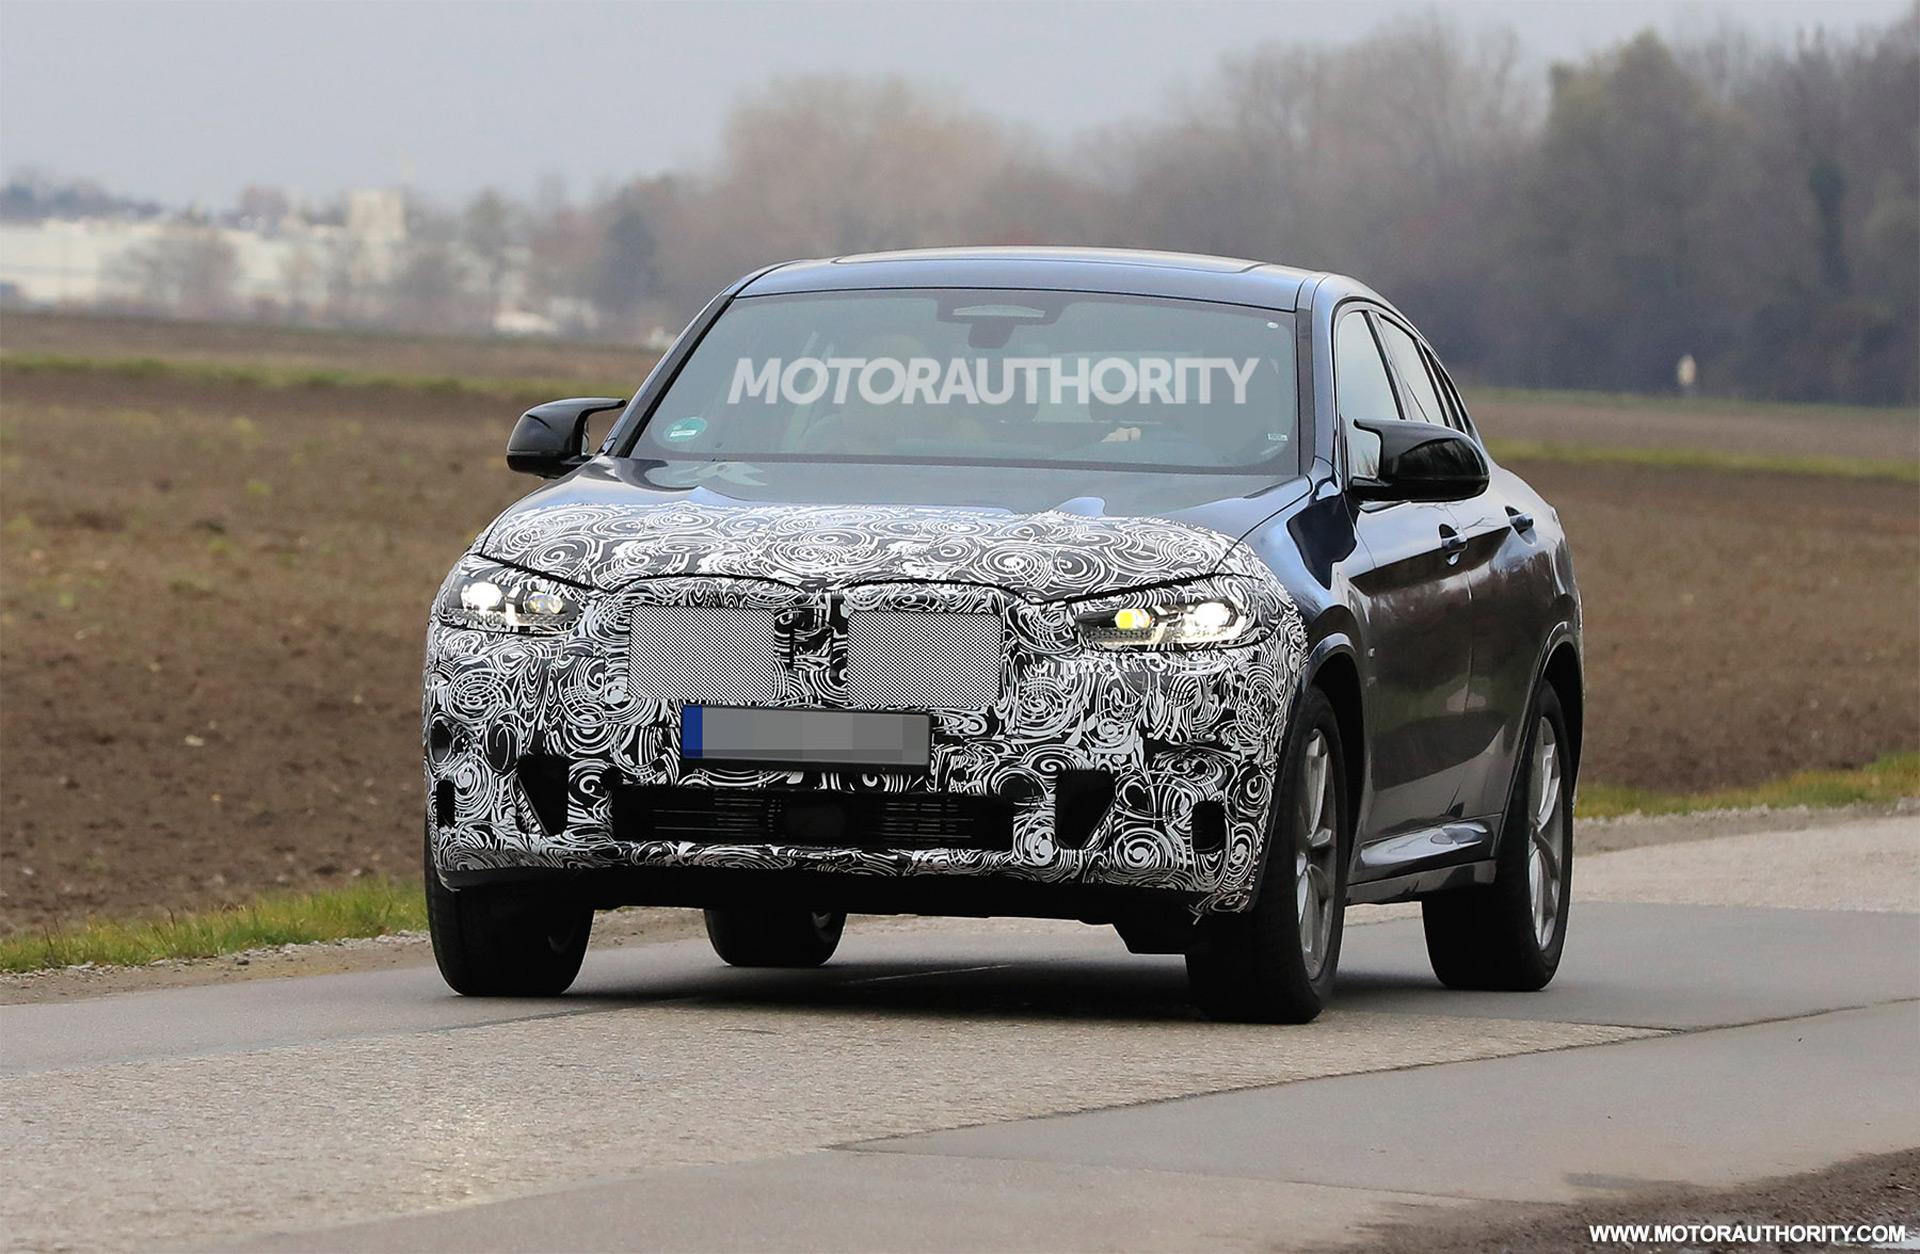 2022 BMW X4 spy shots: Mid-cycle refresh on the way